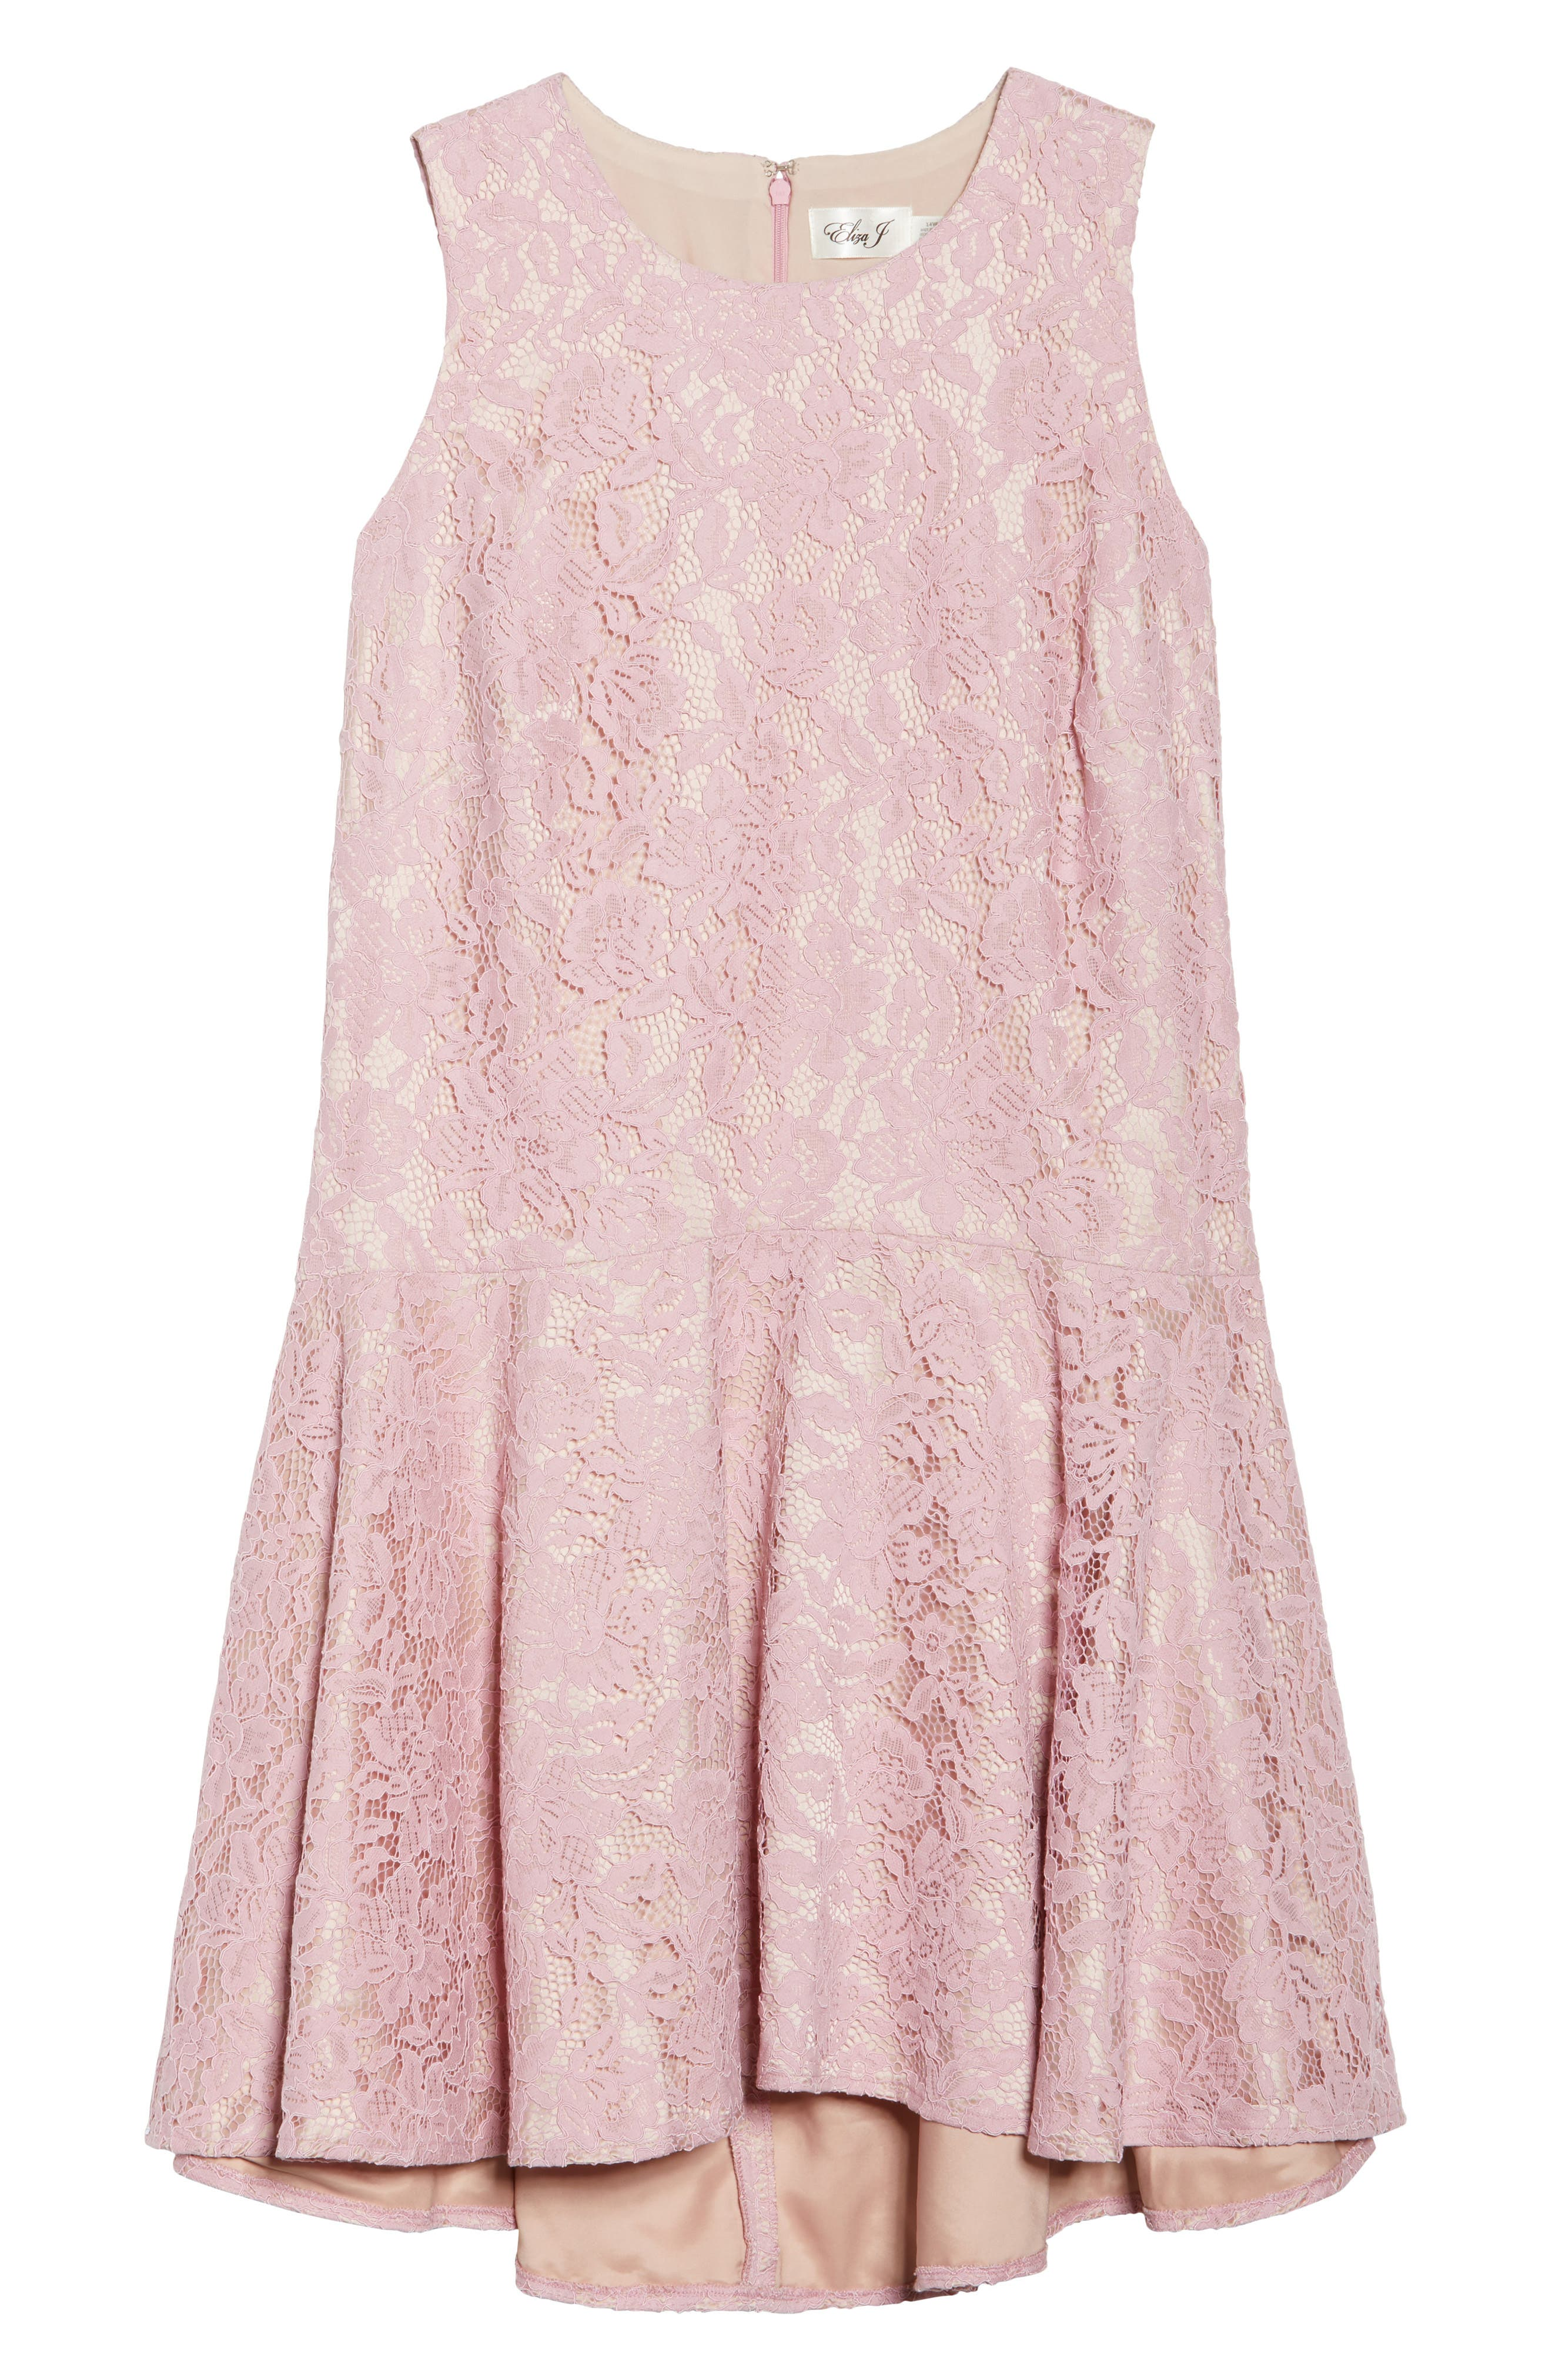 Lace Sleeveless Drop Waist Dress,                             Alternate thumbnail 6, color,                             Blush